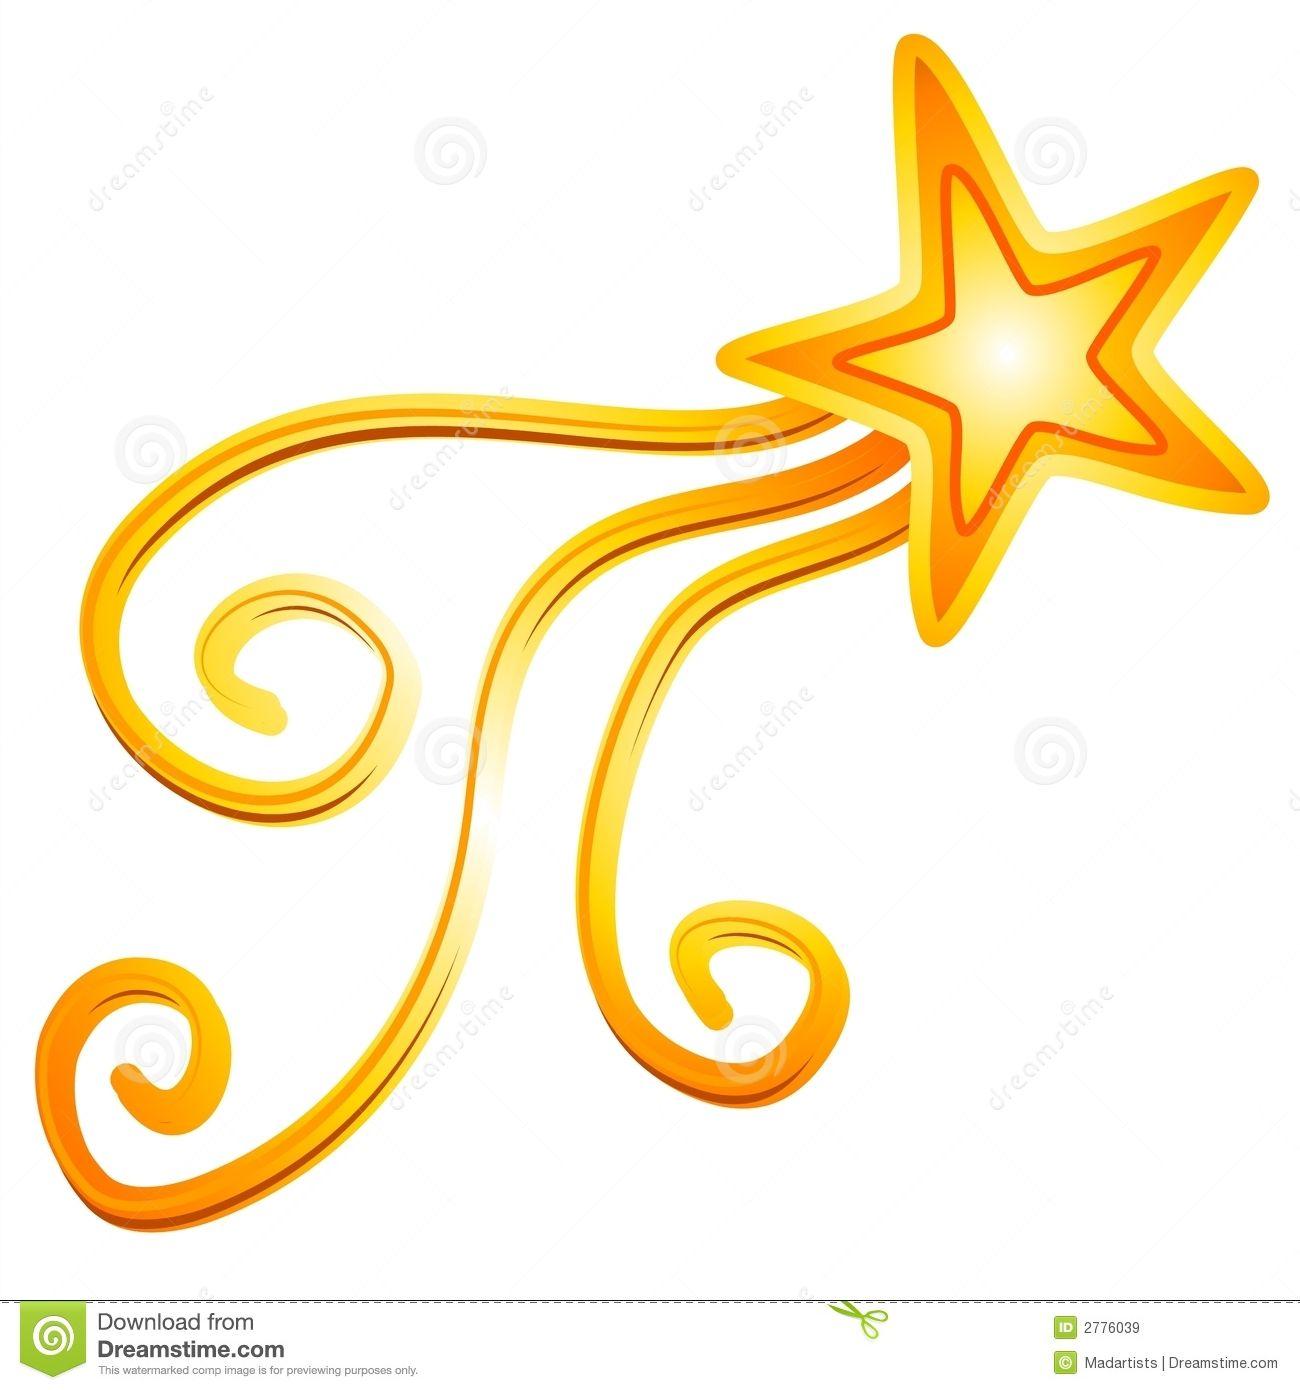 10++ Gold star clipart free ideas